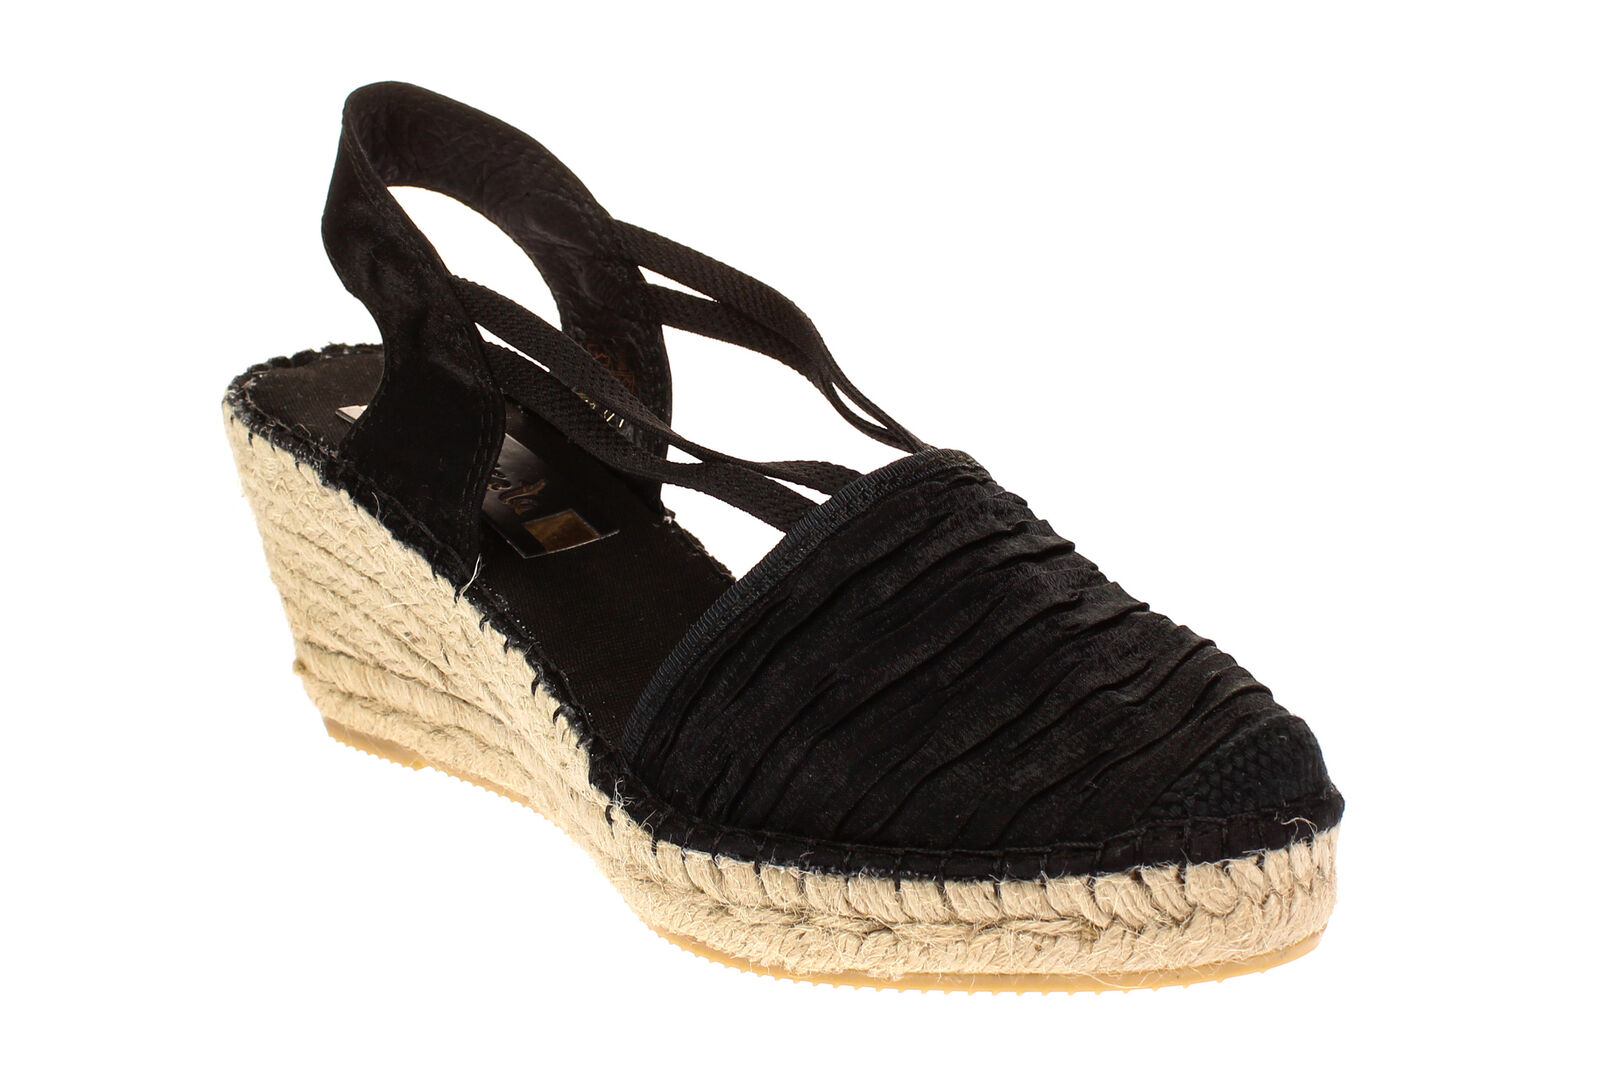 f6548a42f4fdde Vidoretta 18400-SEÑORA zapatos sandalias de cuña zapatos casual-estrella  negra